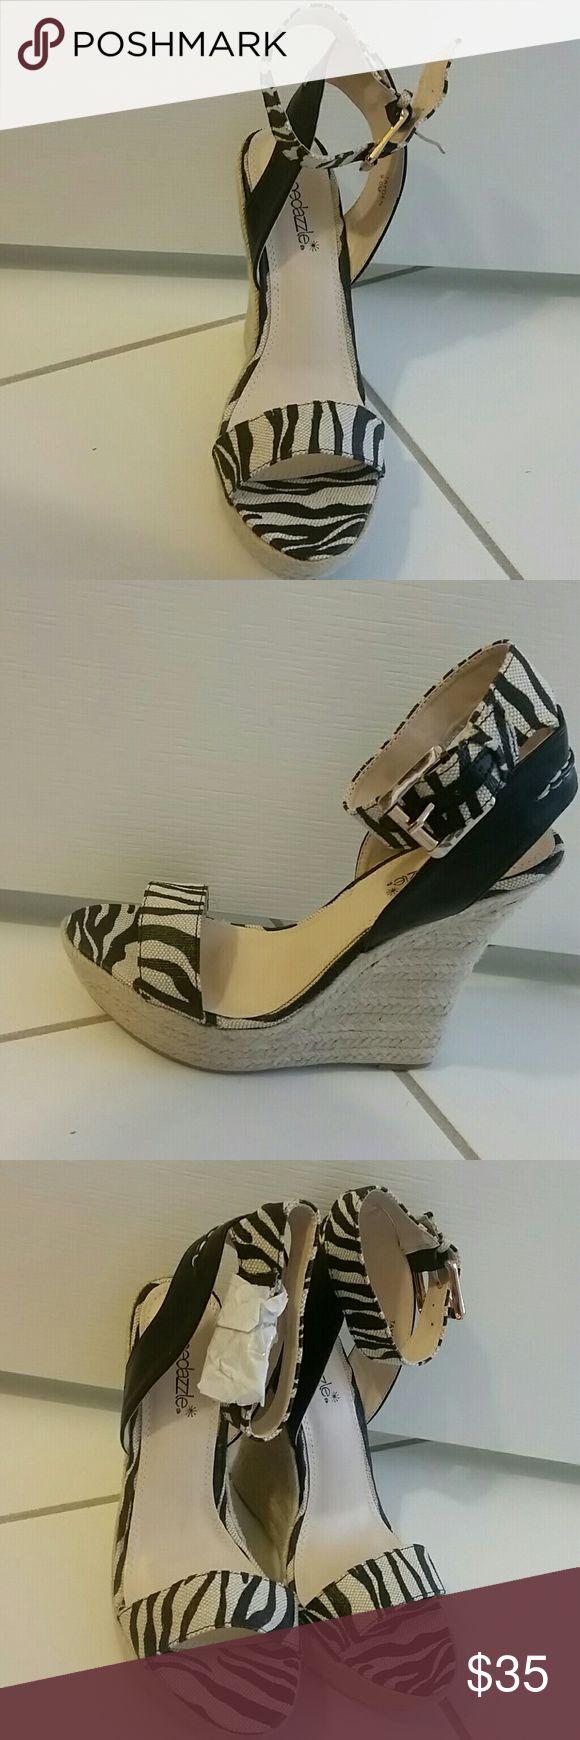 Zebra print beige wedge, never worn Zebra print beige wedge, never worn Shoes Wedges